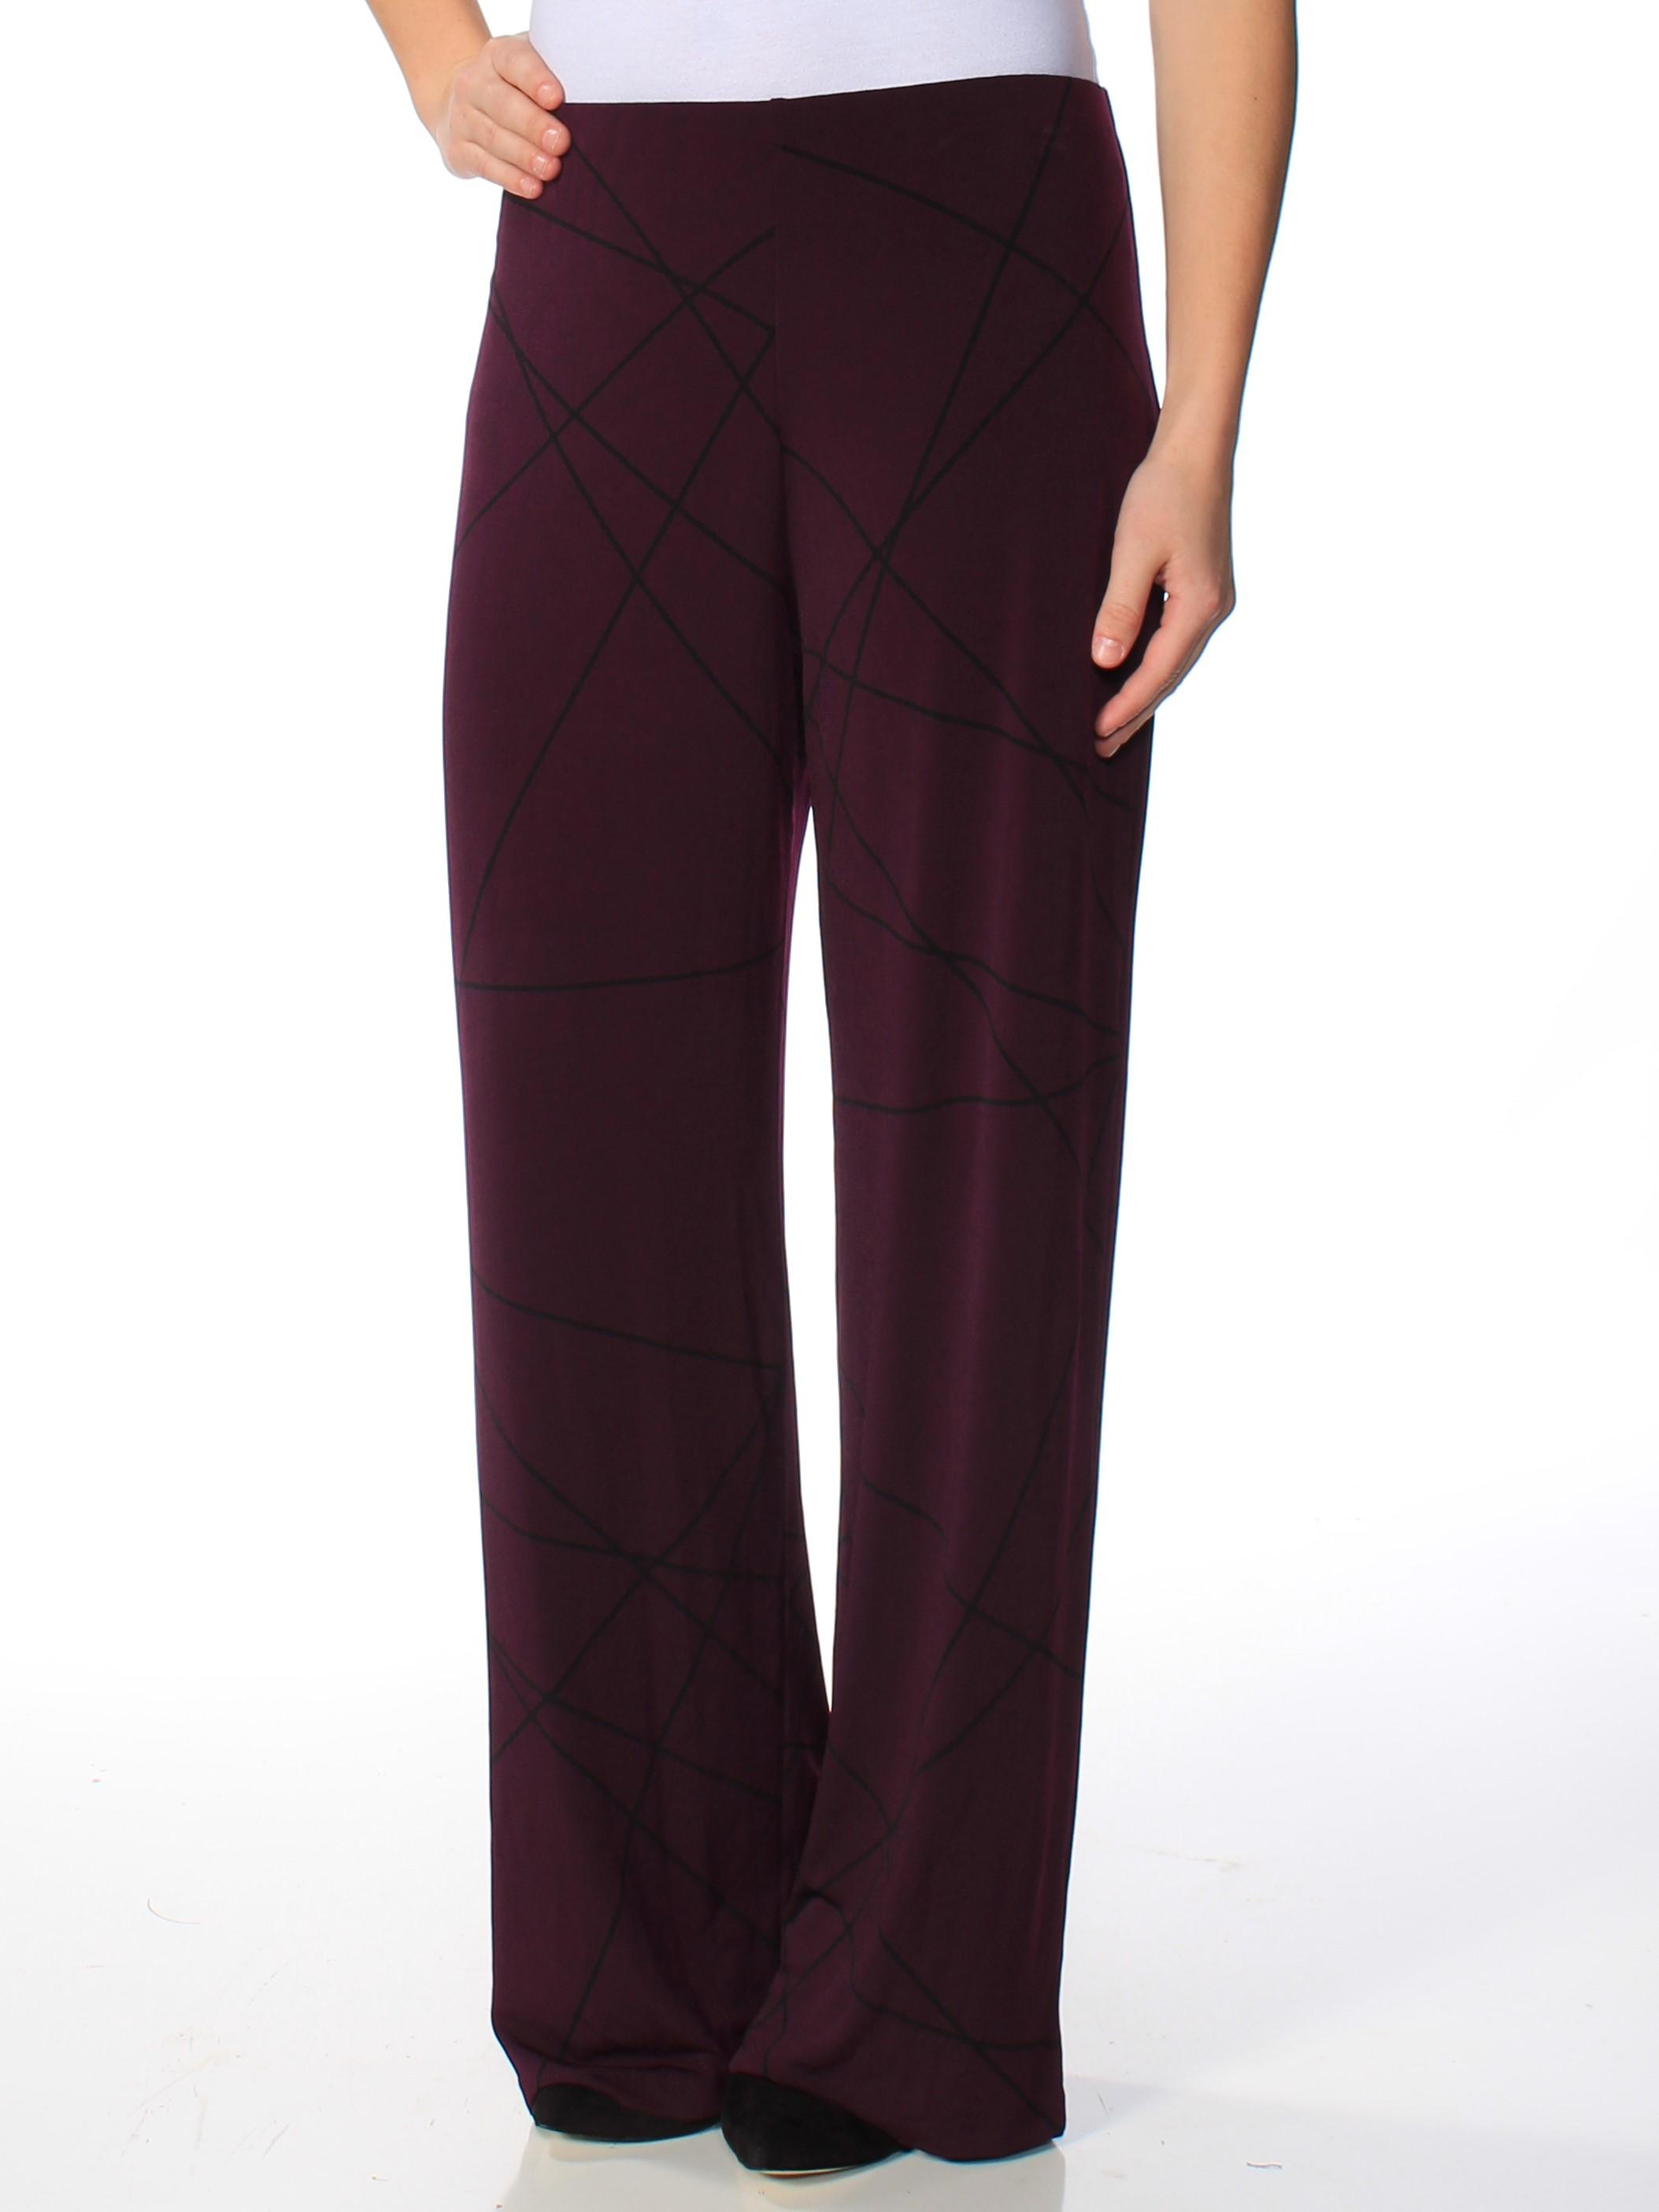 ALFANI Womens Purple Printed Pants  Size: XXL